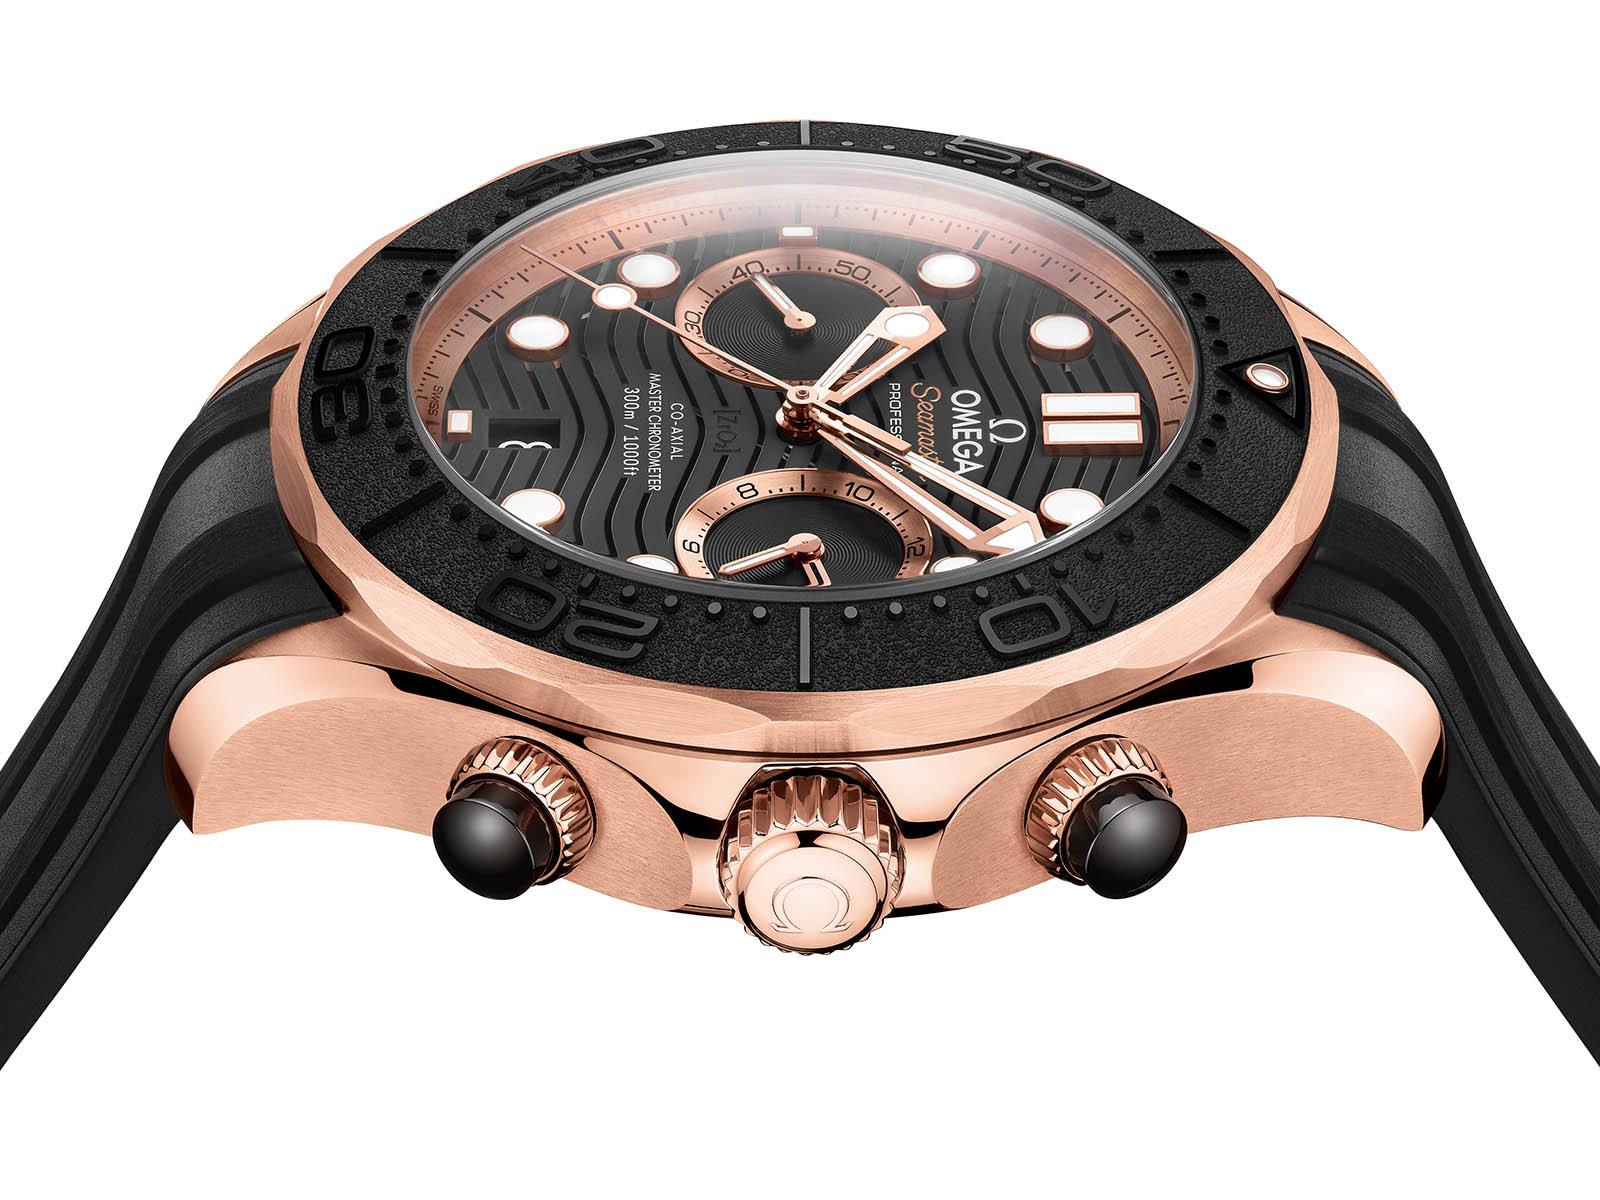 210-62-44-51-01-001-omega-seamaster-diver-300m-chronograph-3.jpg